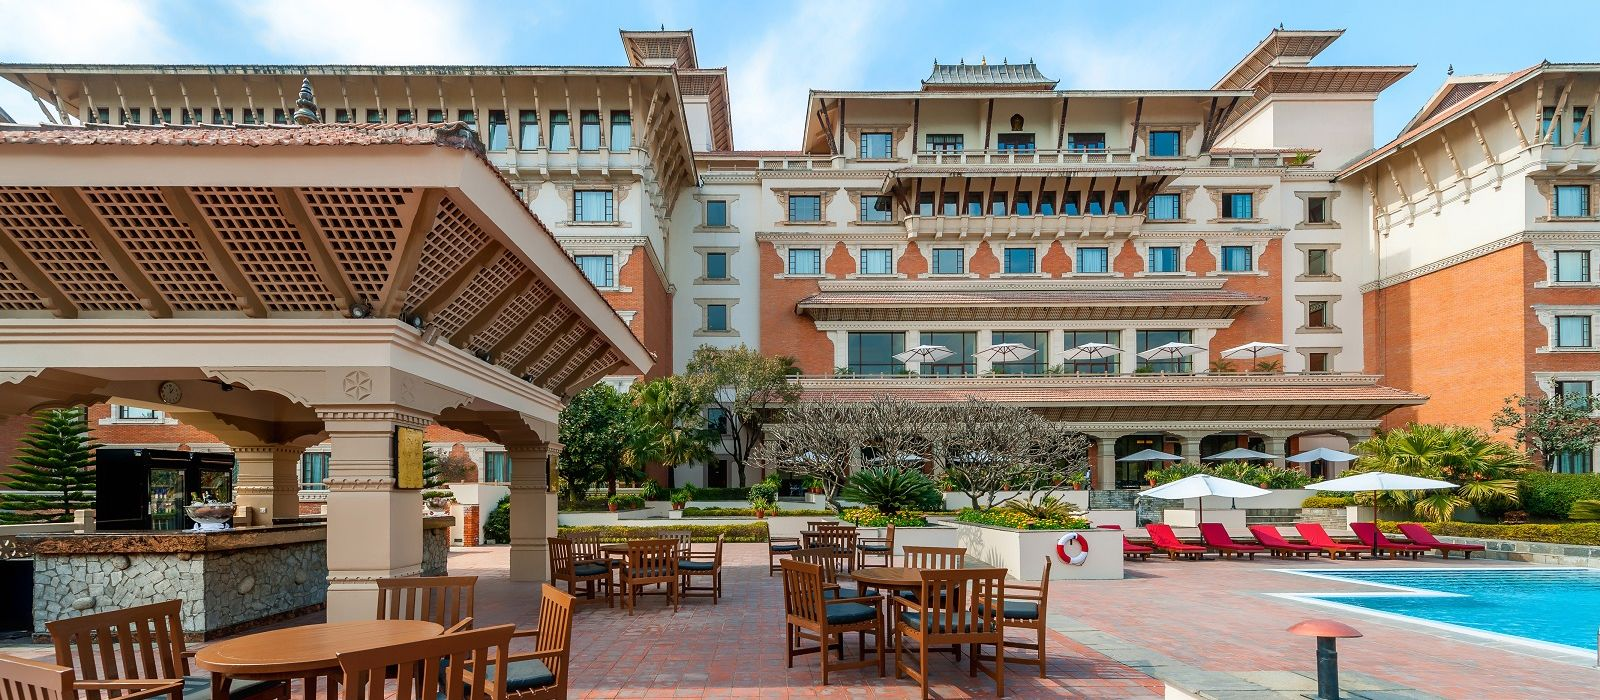 Hotel Hyatt Regency, Kathmandu Nepal